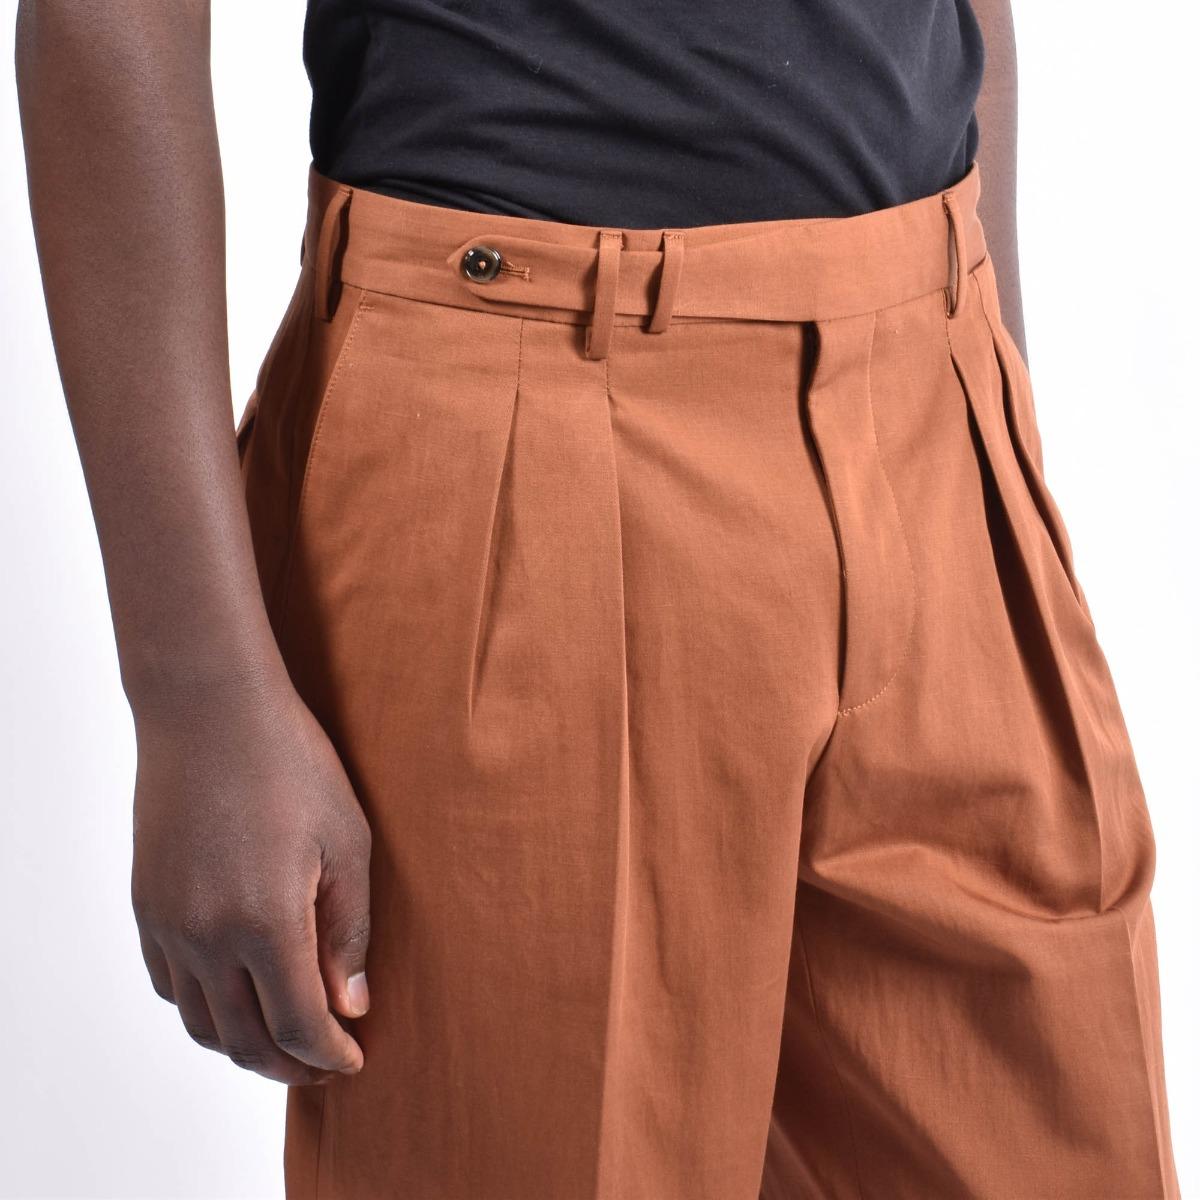 Pantalone carrot fit e pences - Mattone